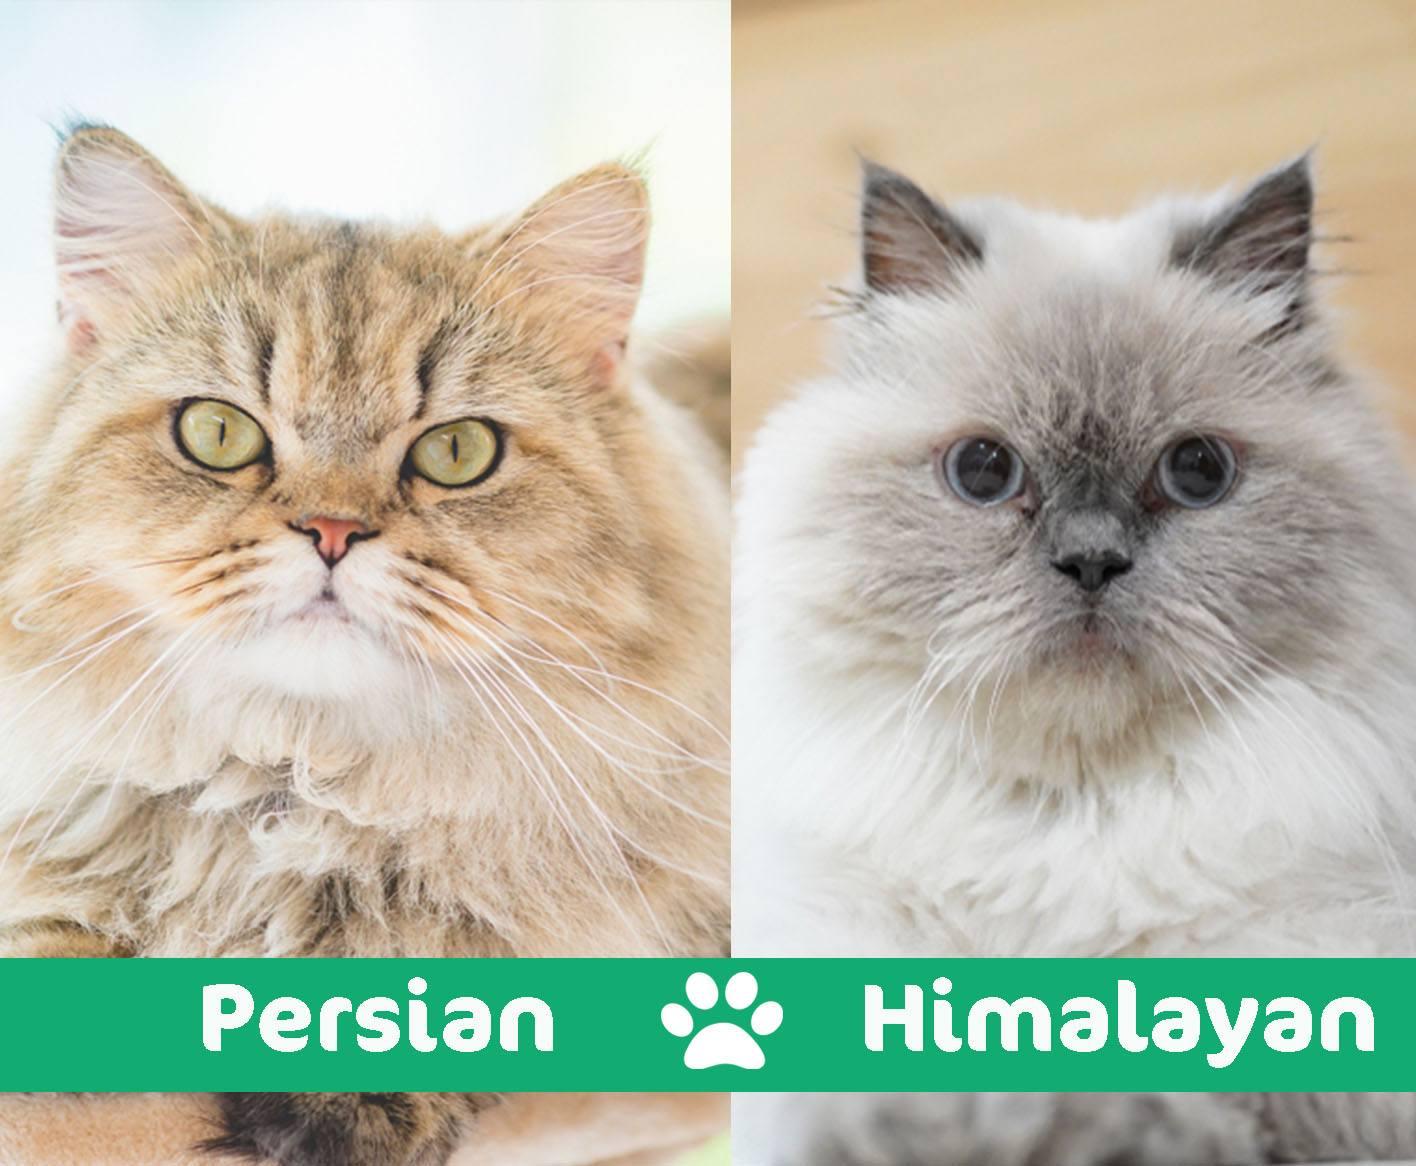 persian vs himalayan